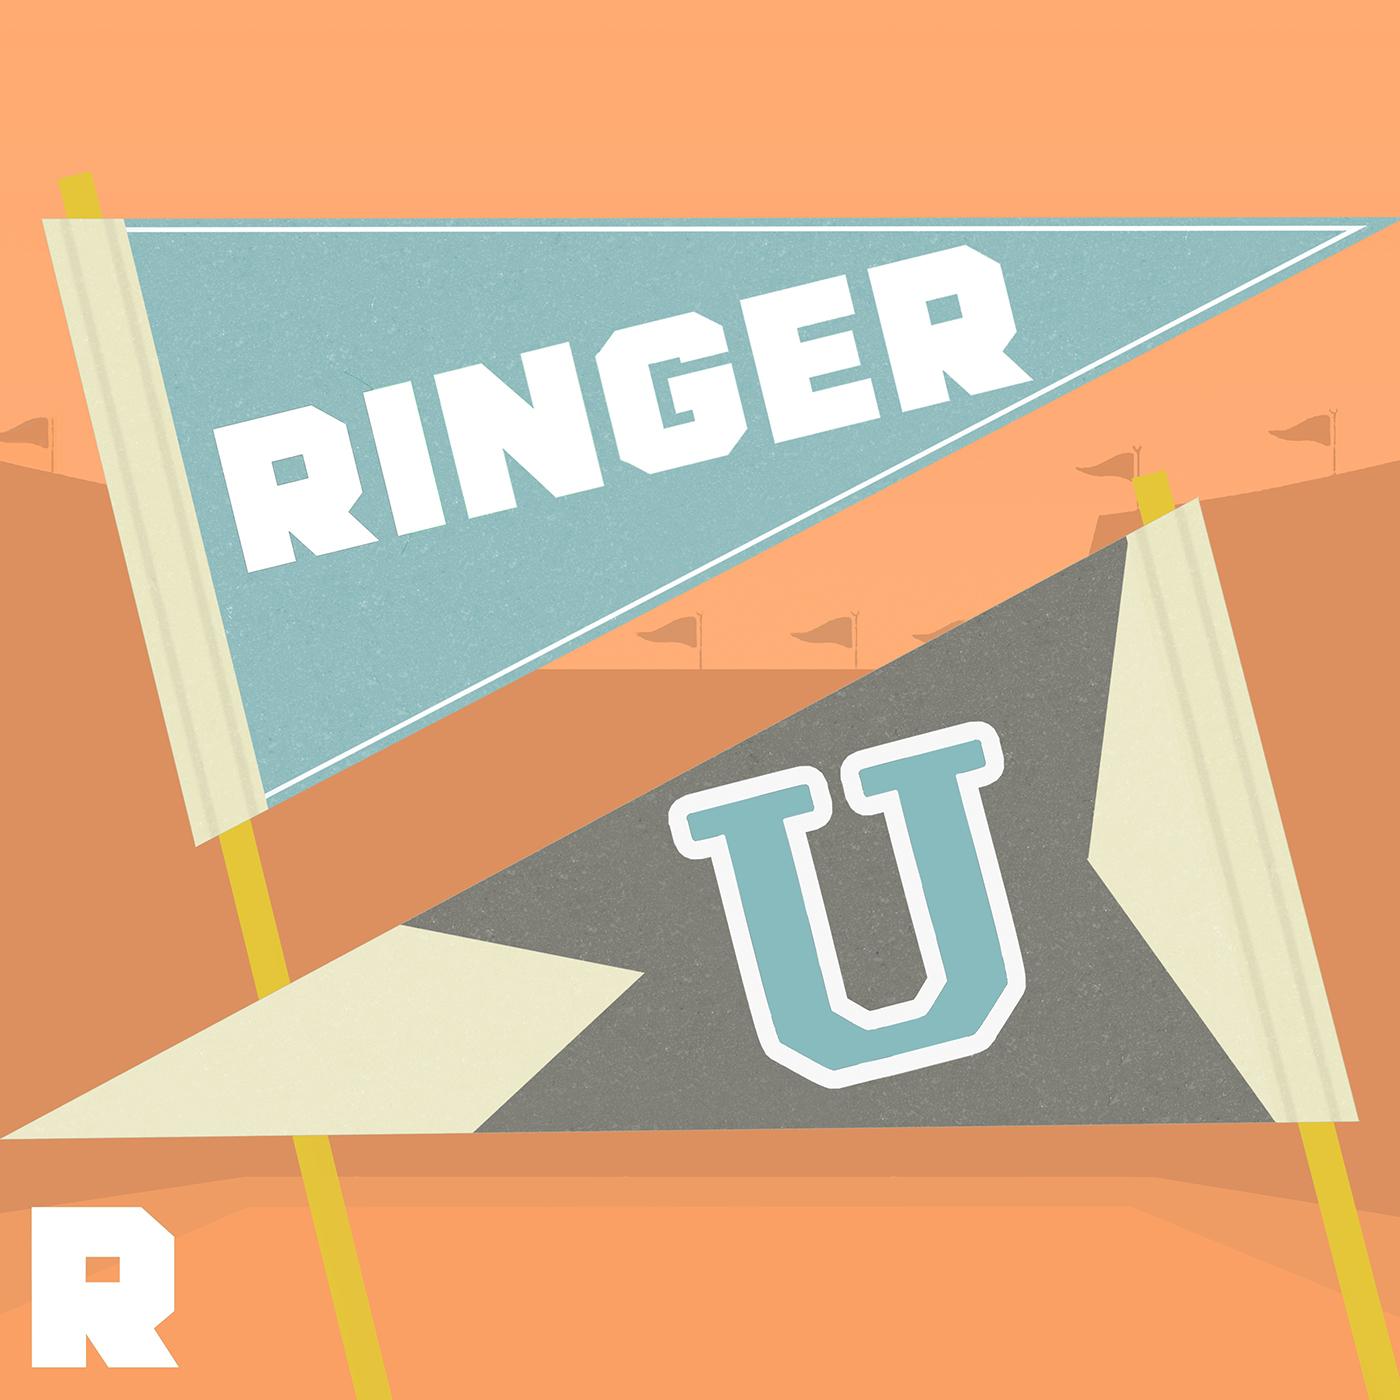 Through The Ringer